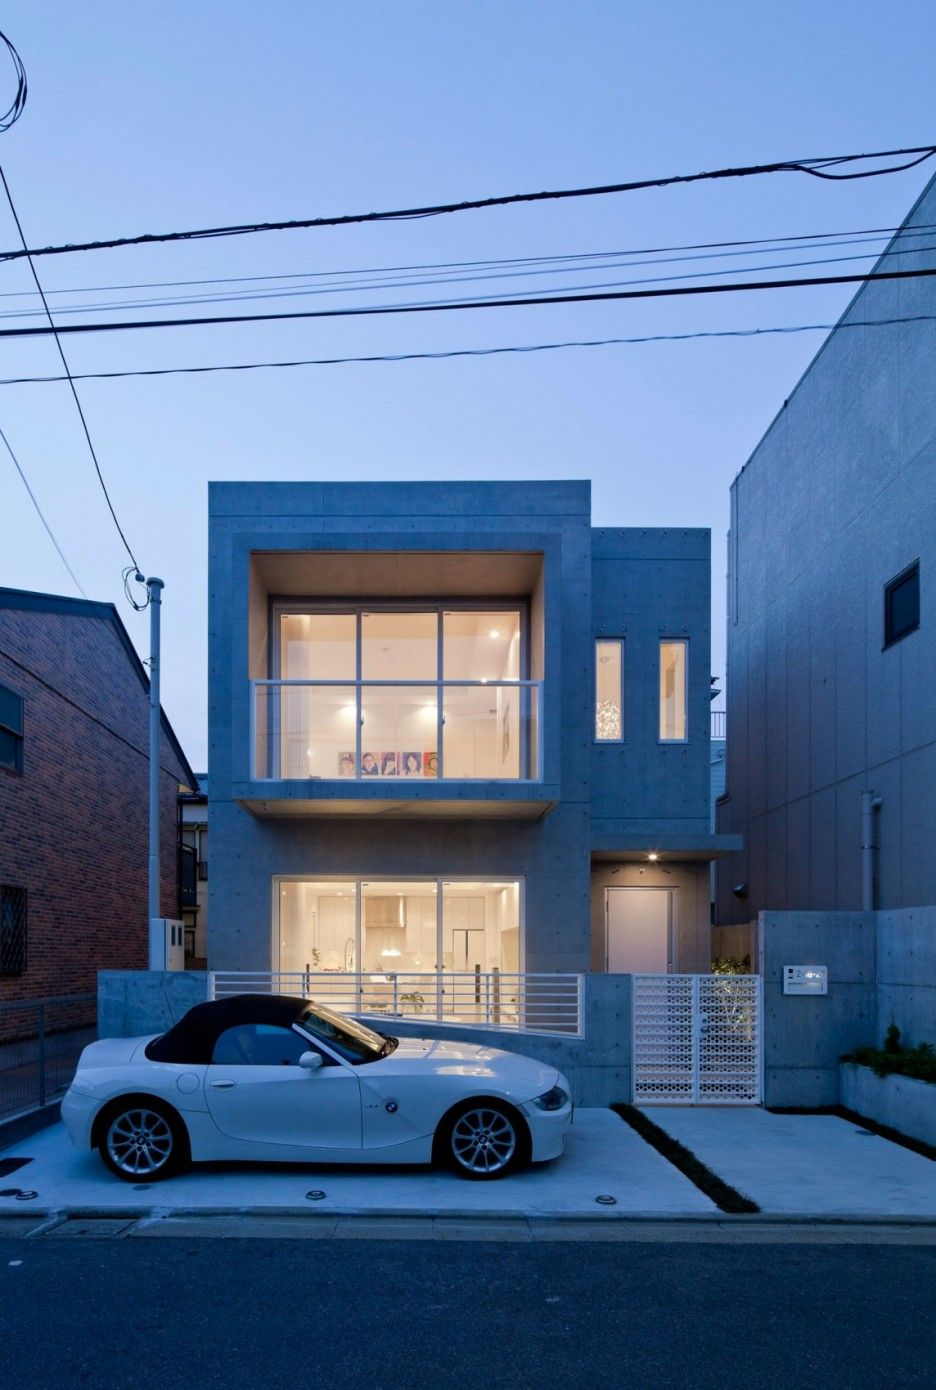 d94da9171c85c0d0da8be190c466e729 - 37+ Japanese Modern Small House Design  Pics